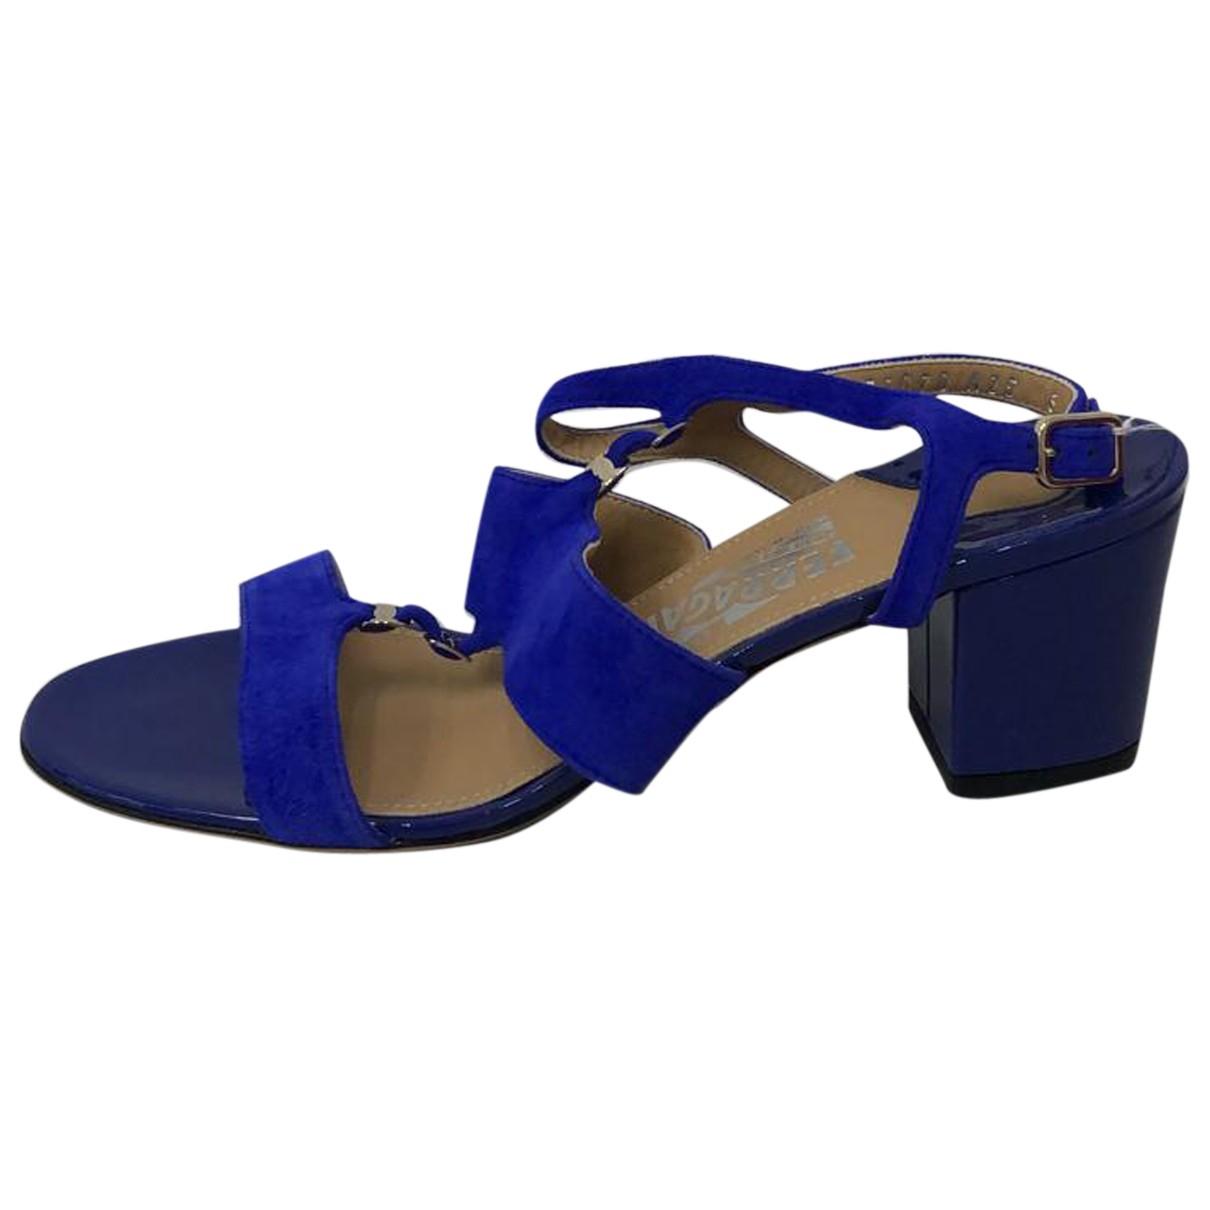 Salvatore Ferragamo N Blue Suede Sandals for Women 6 US